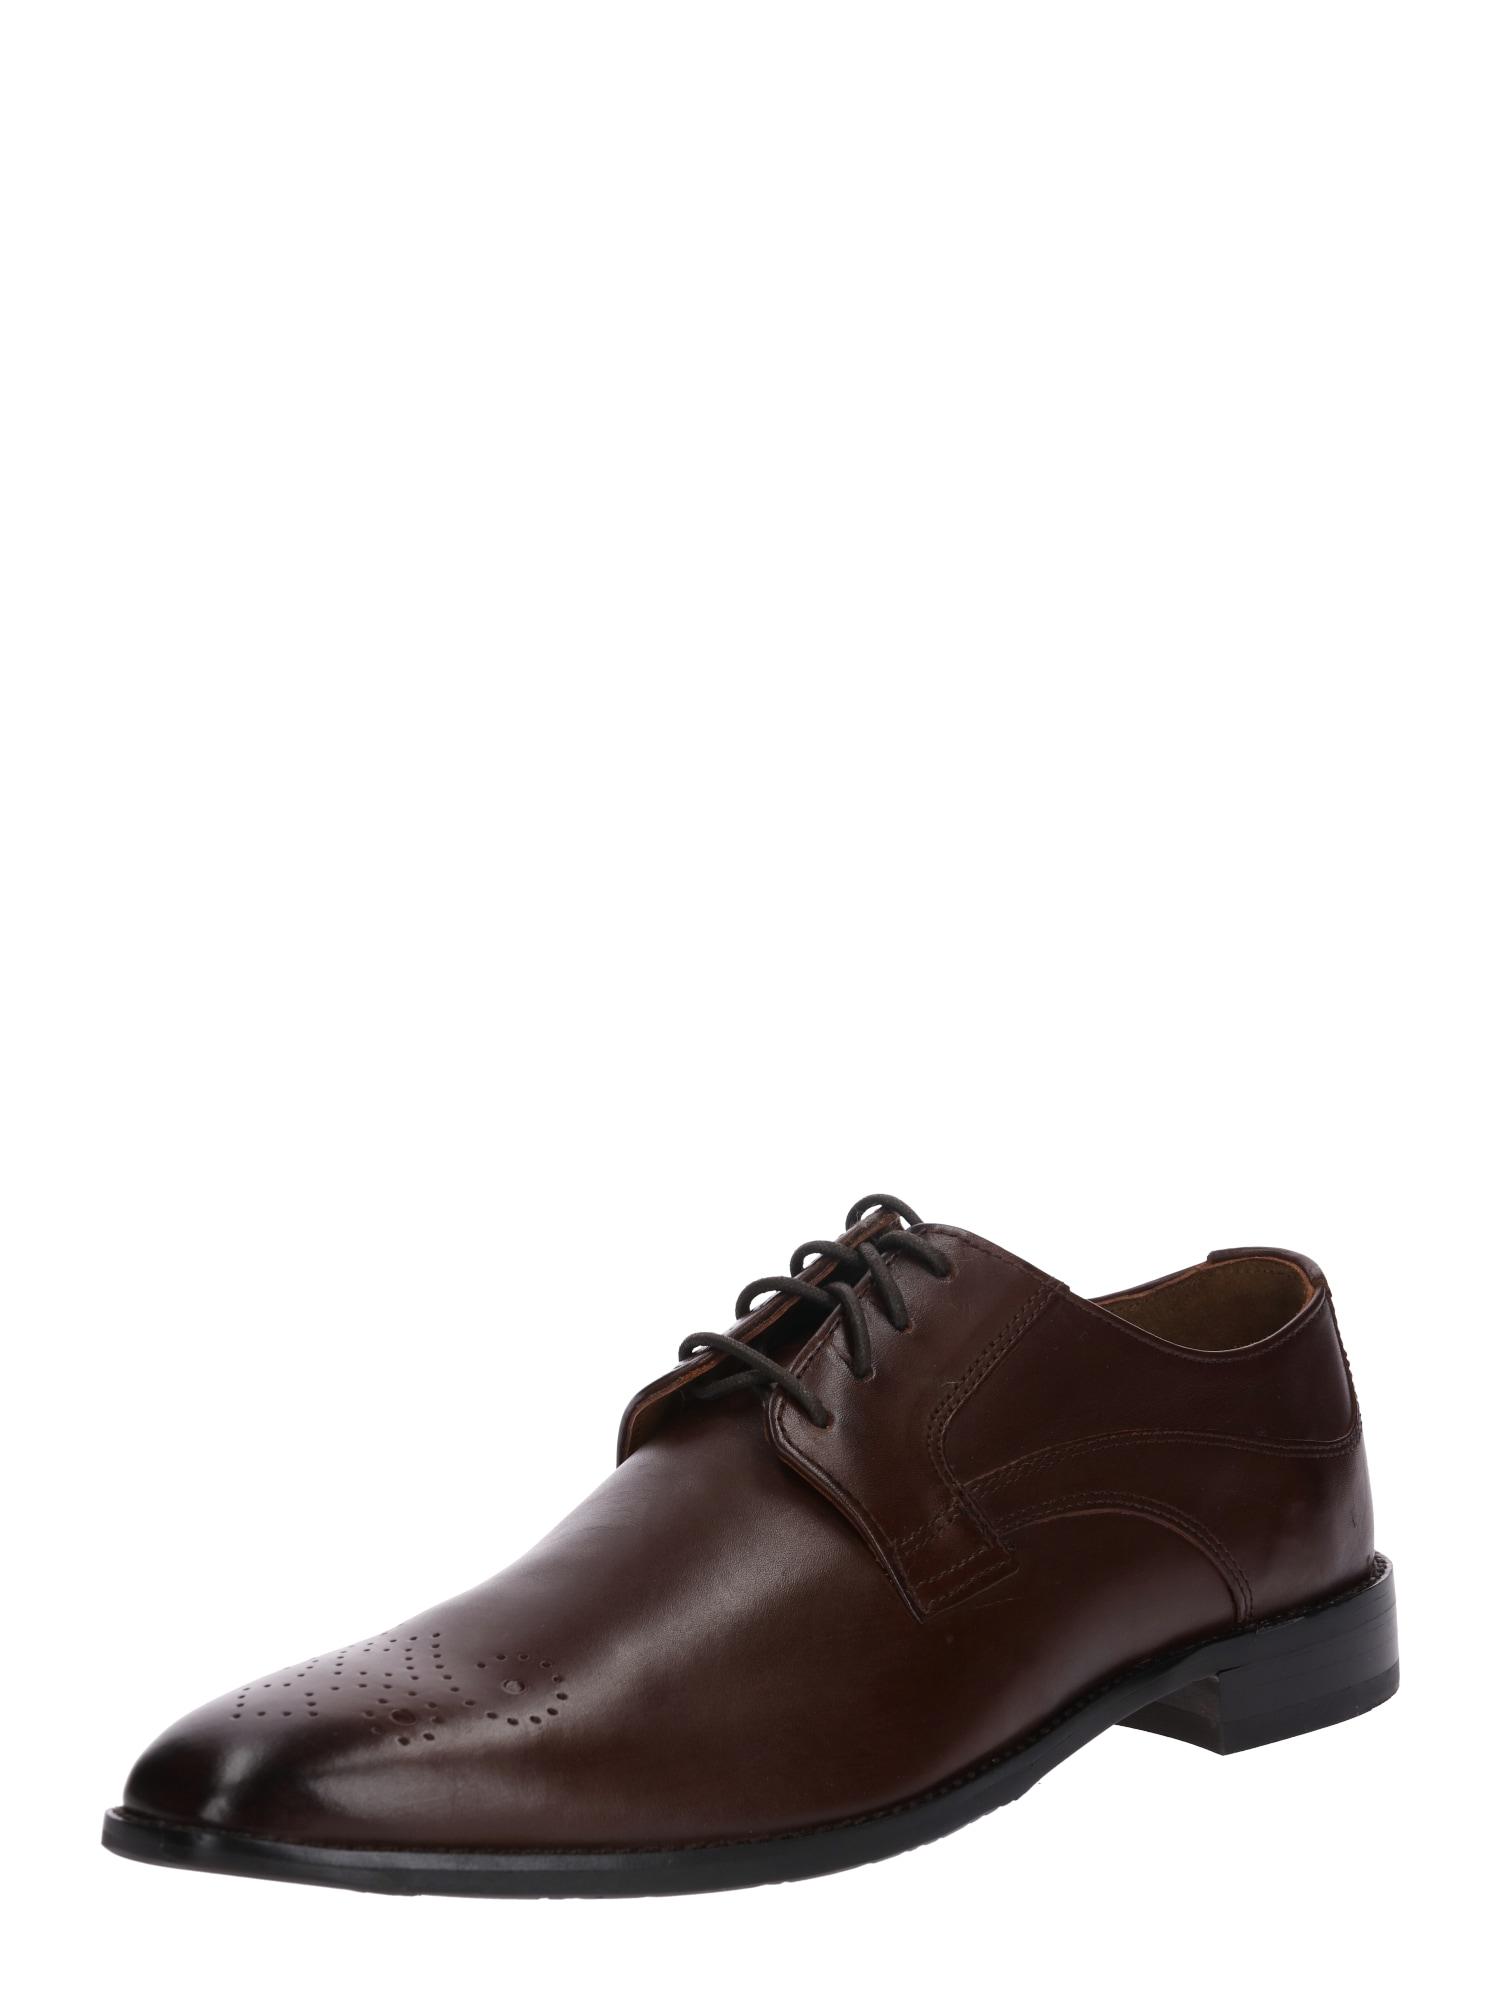 Šněrovací boty Lorenzo tmavě hnědá Gordon & Bros